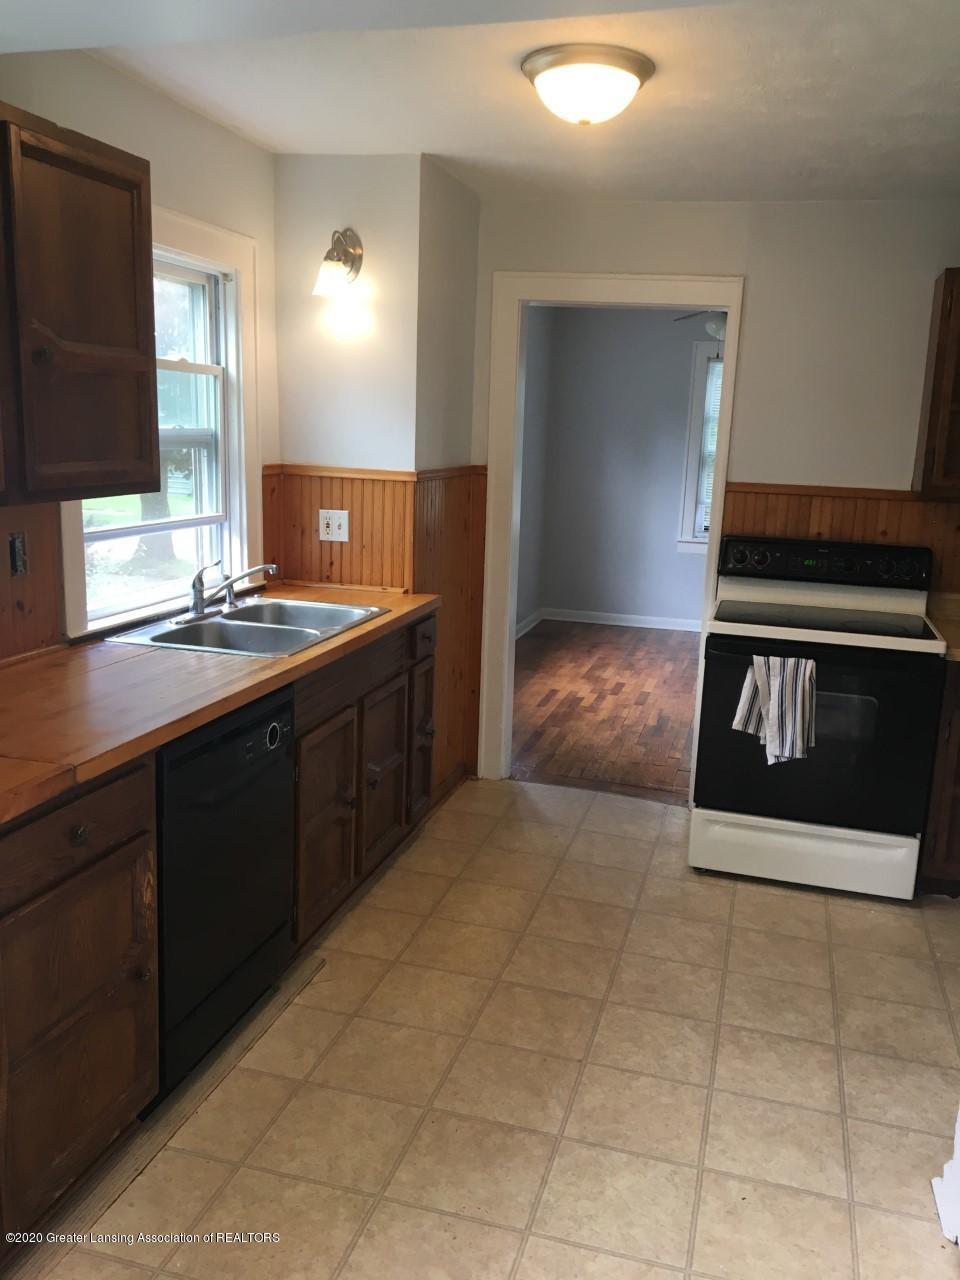 715 Emily Ave - 715 Kitchen 1 - 10